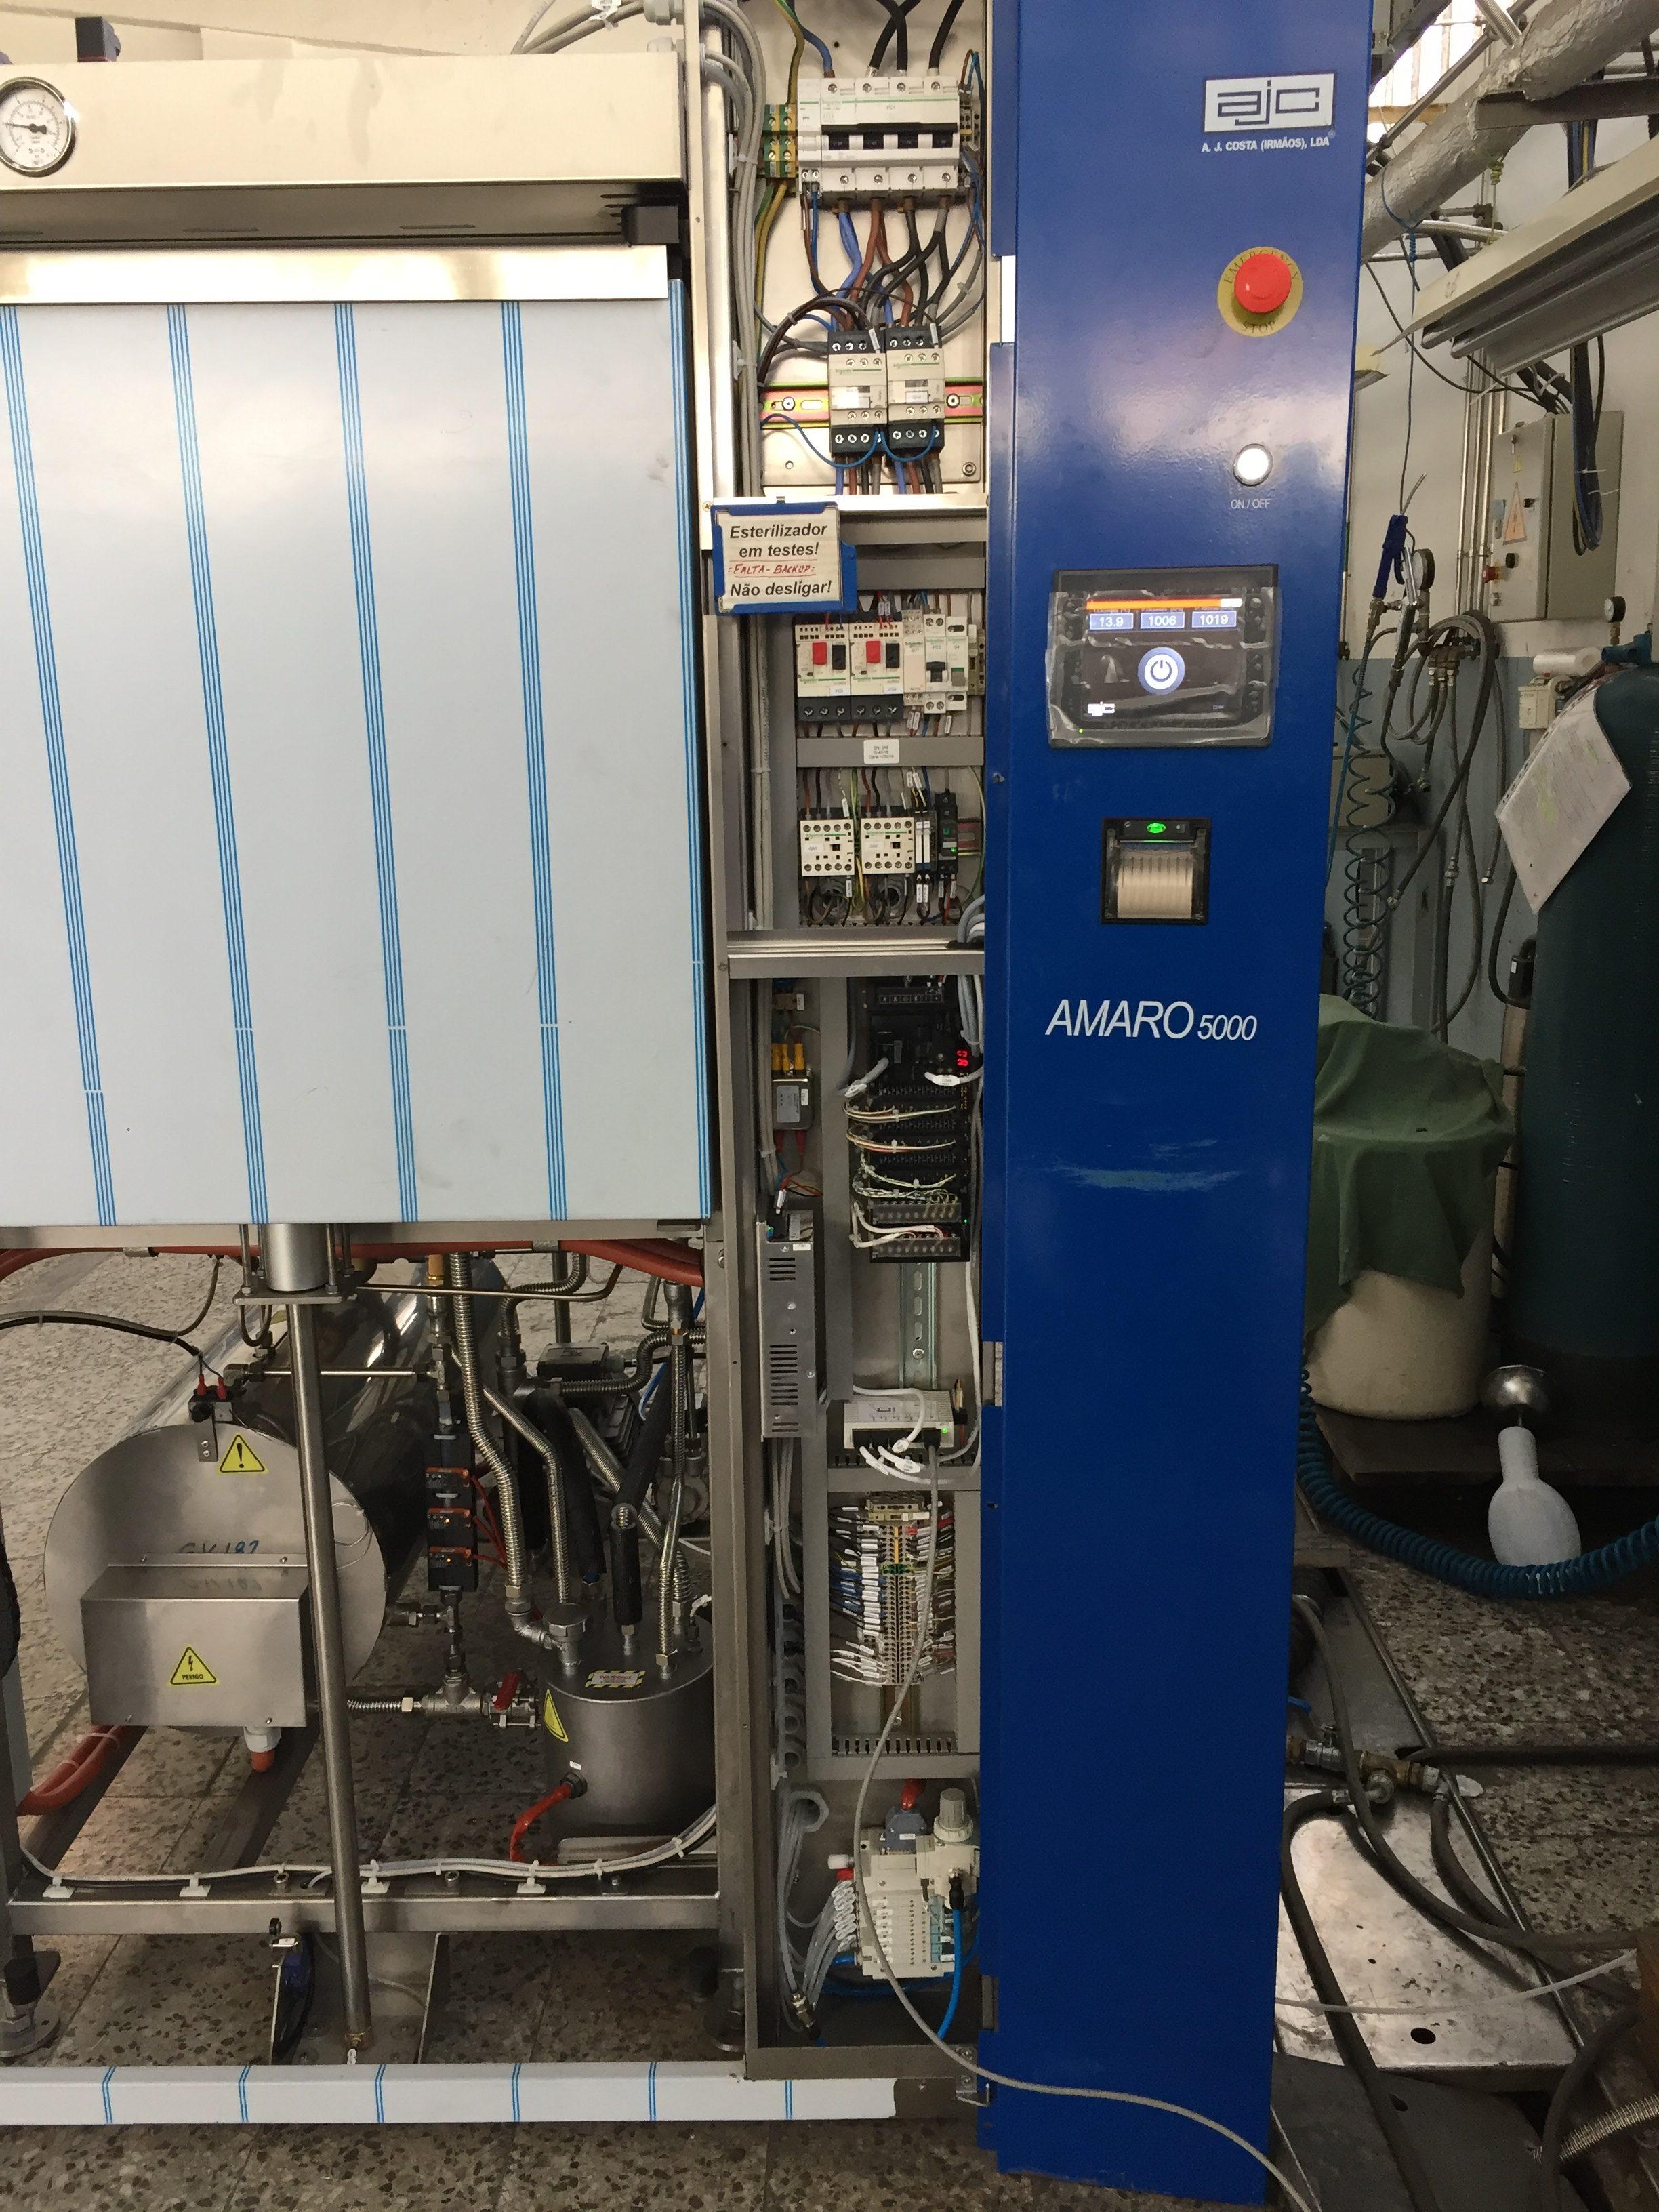 AJC - Validation Amaro 5000